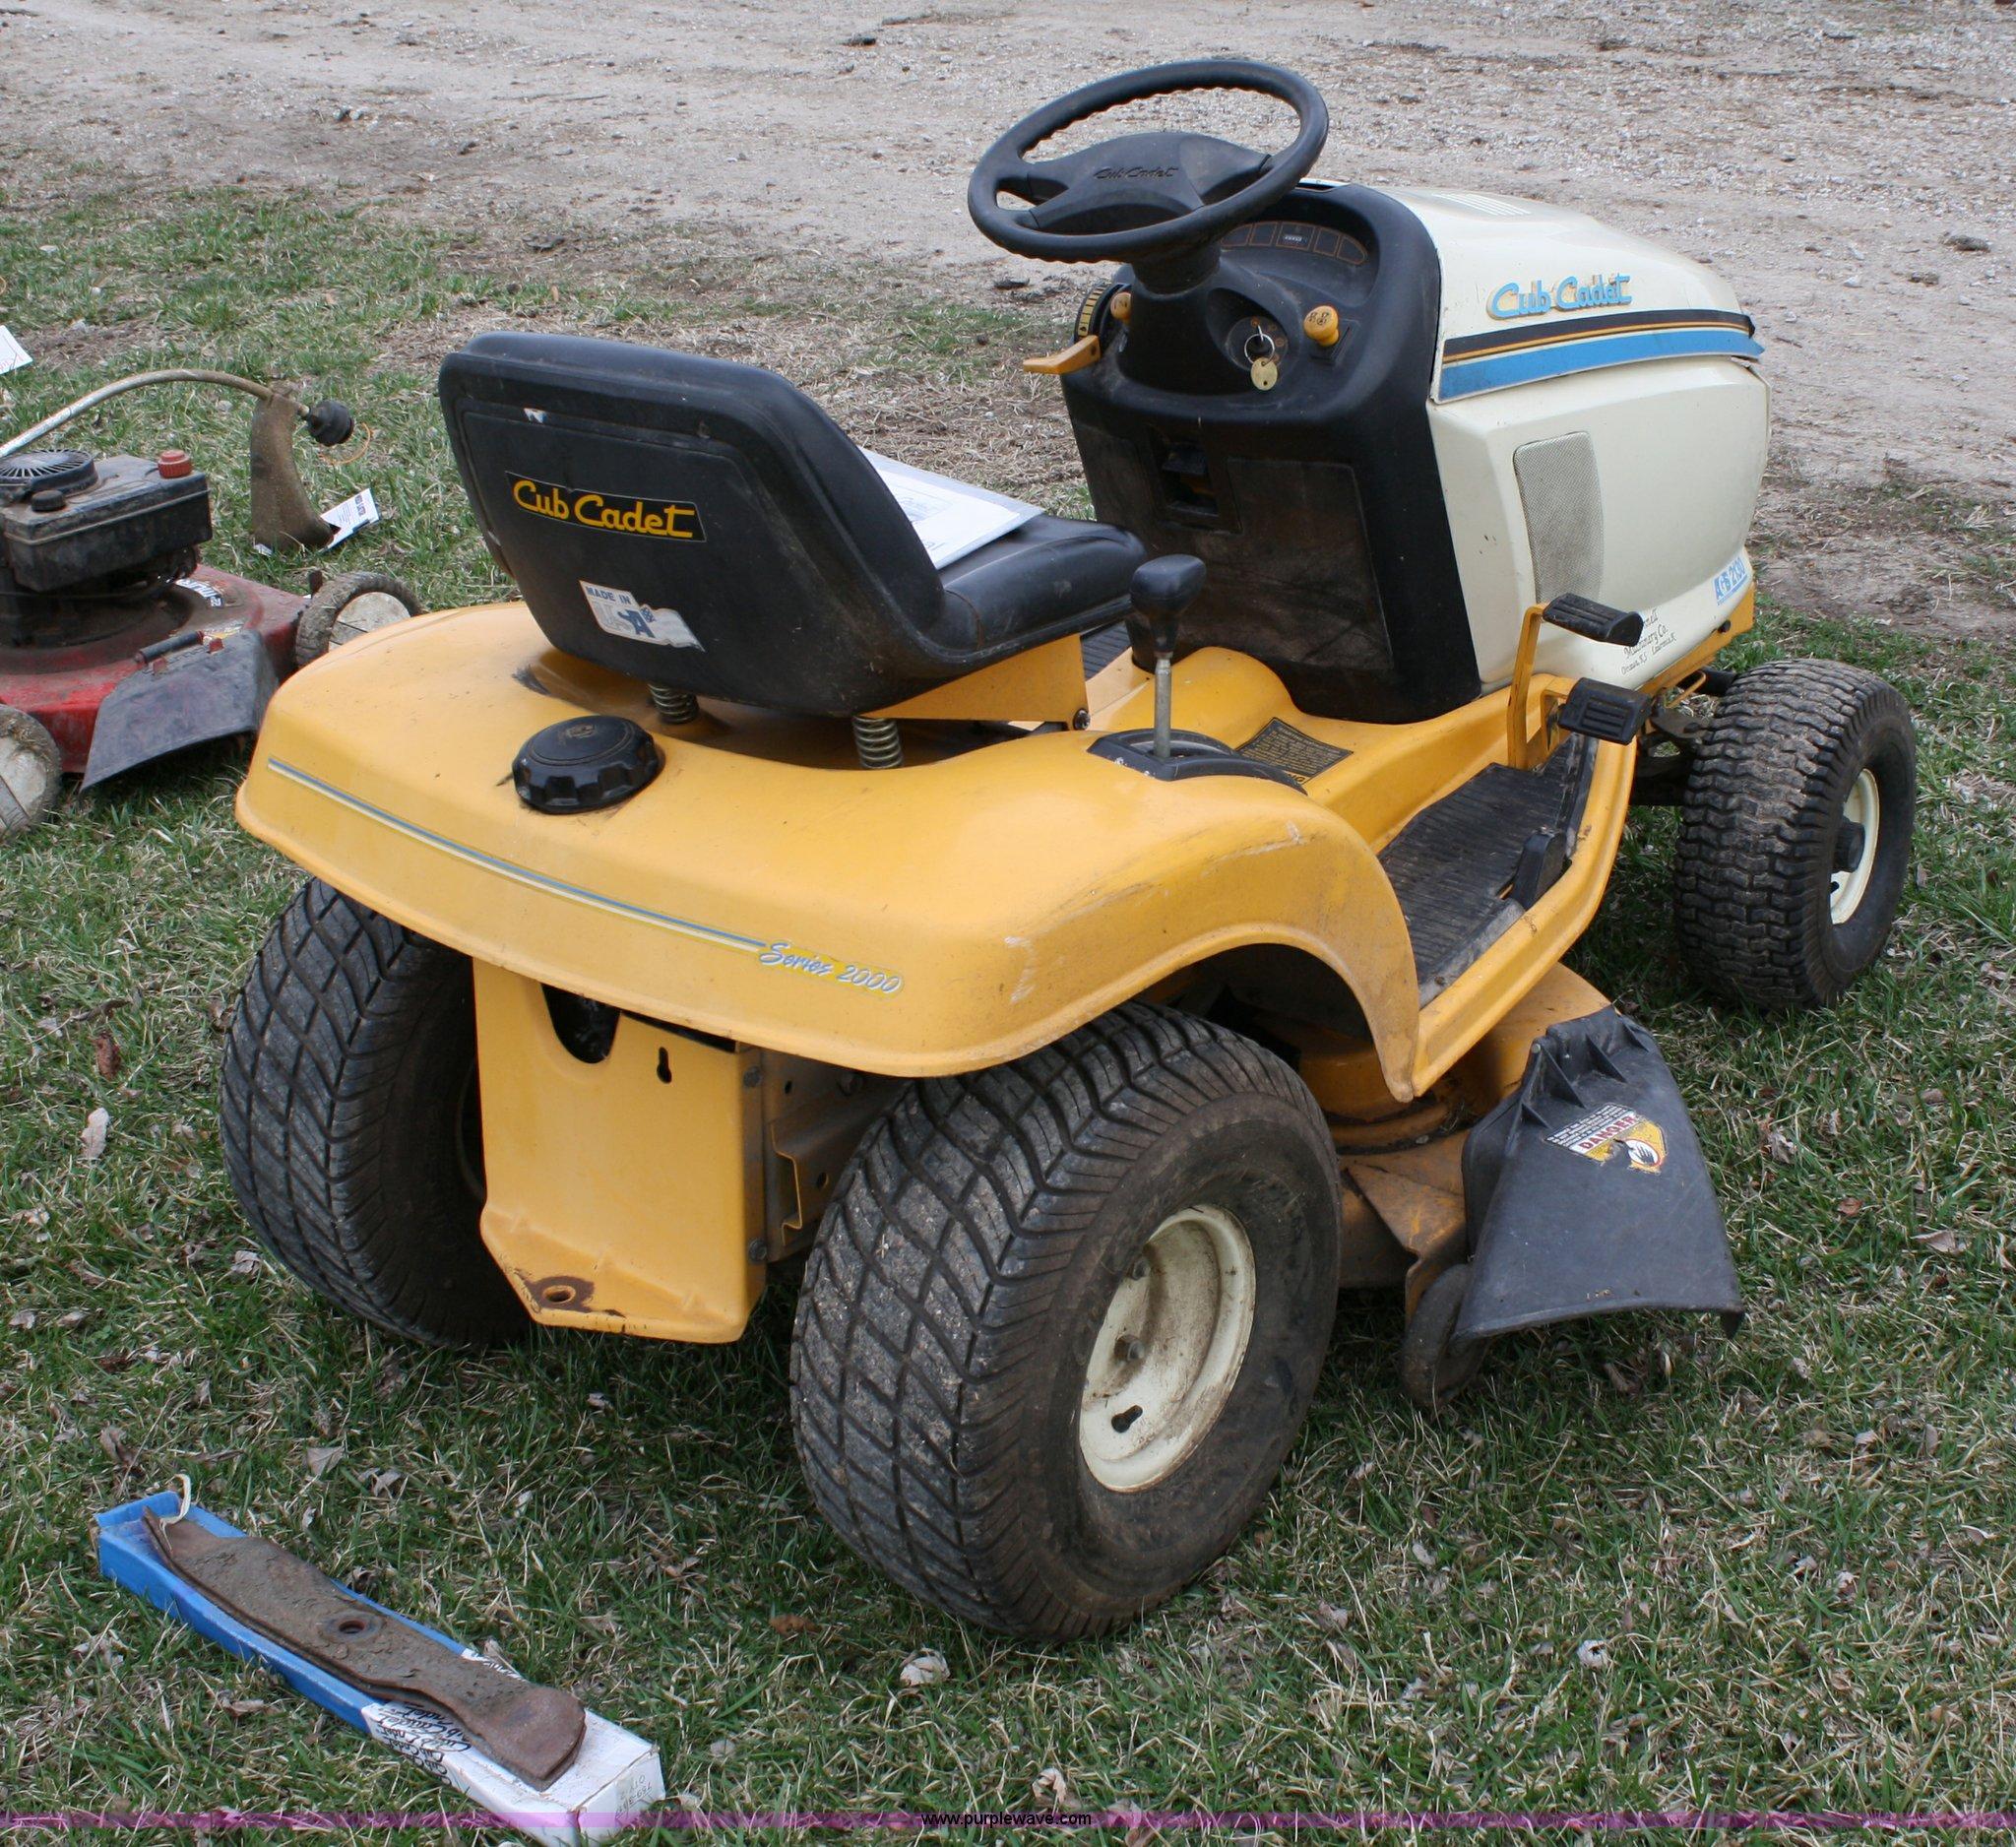 ... Cub Cadet 2130 lawn mower Full size in new window ...